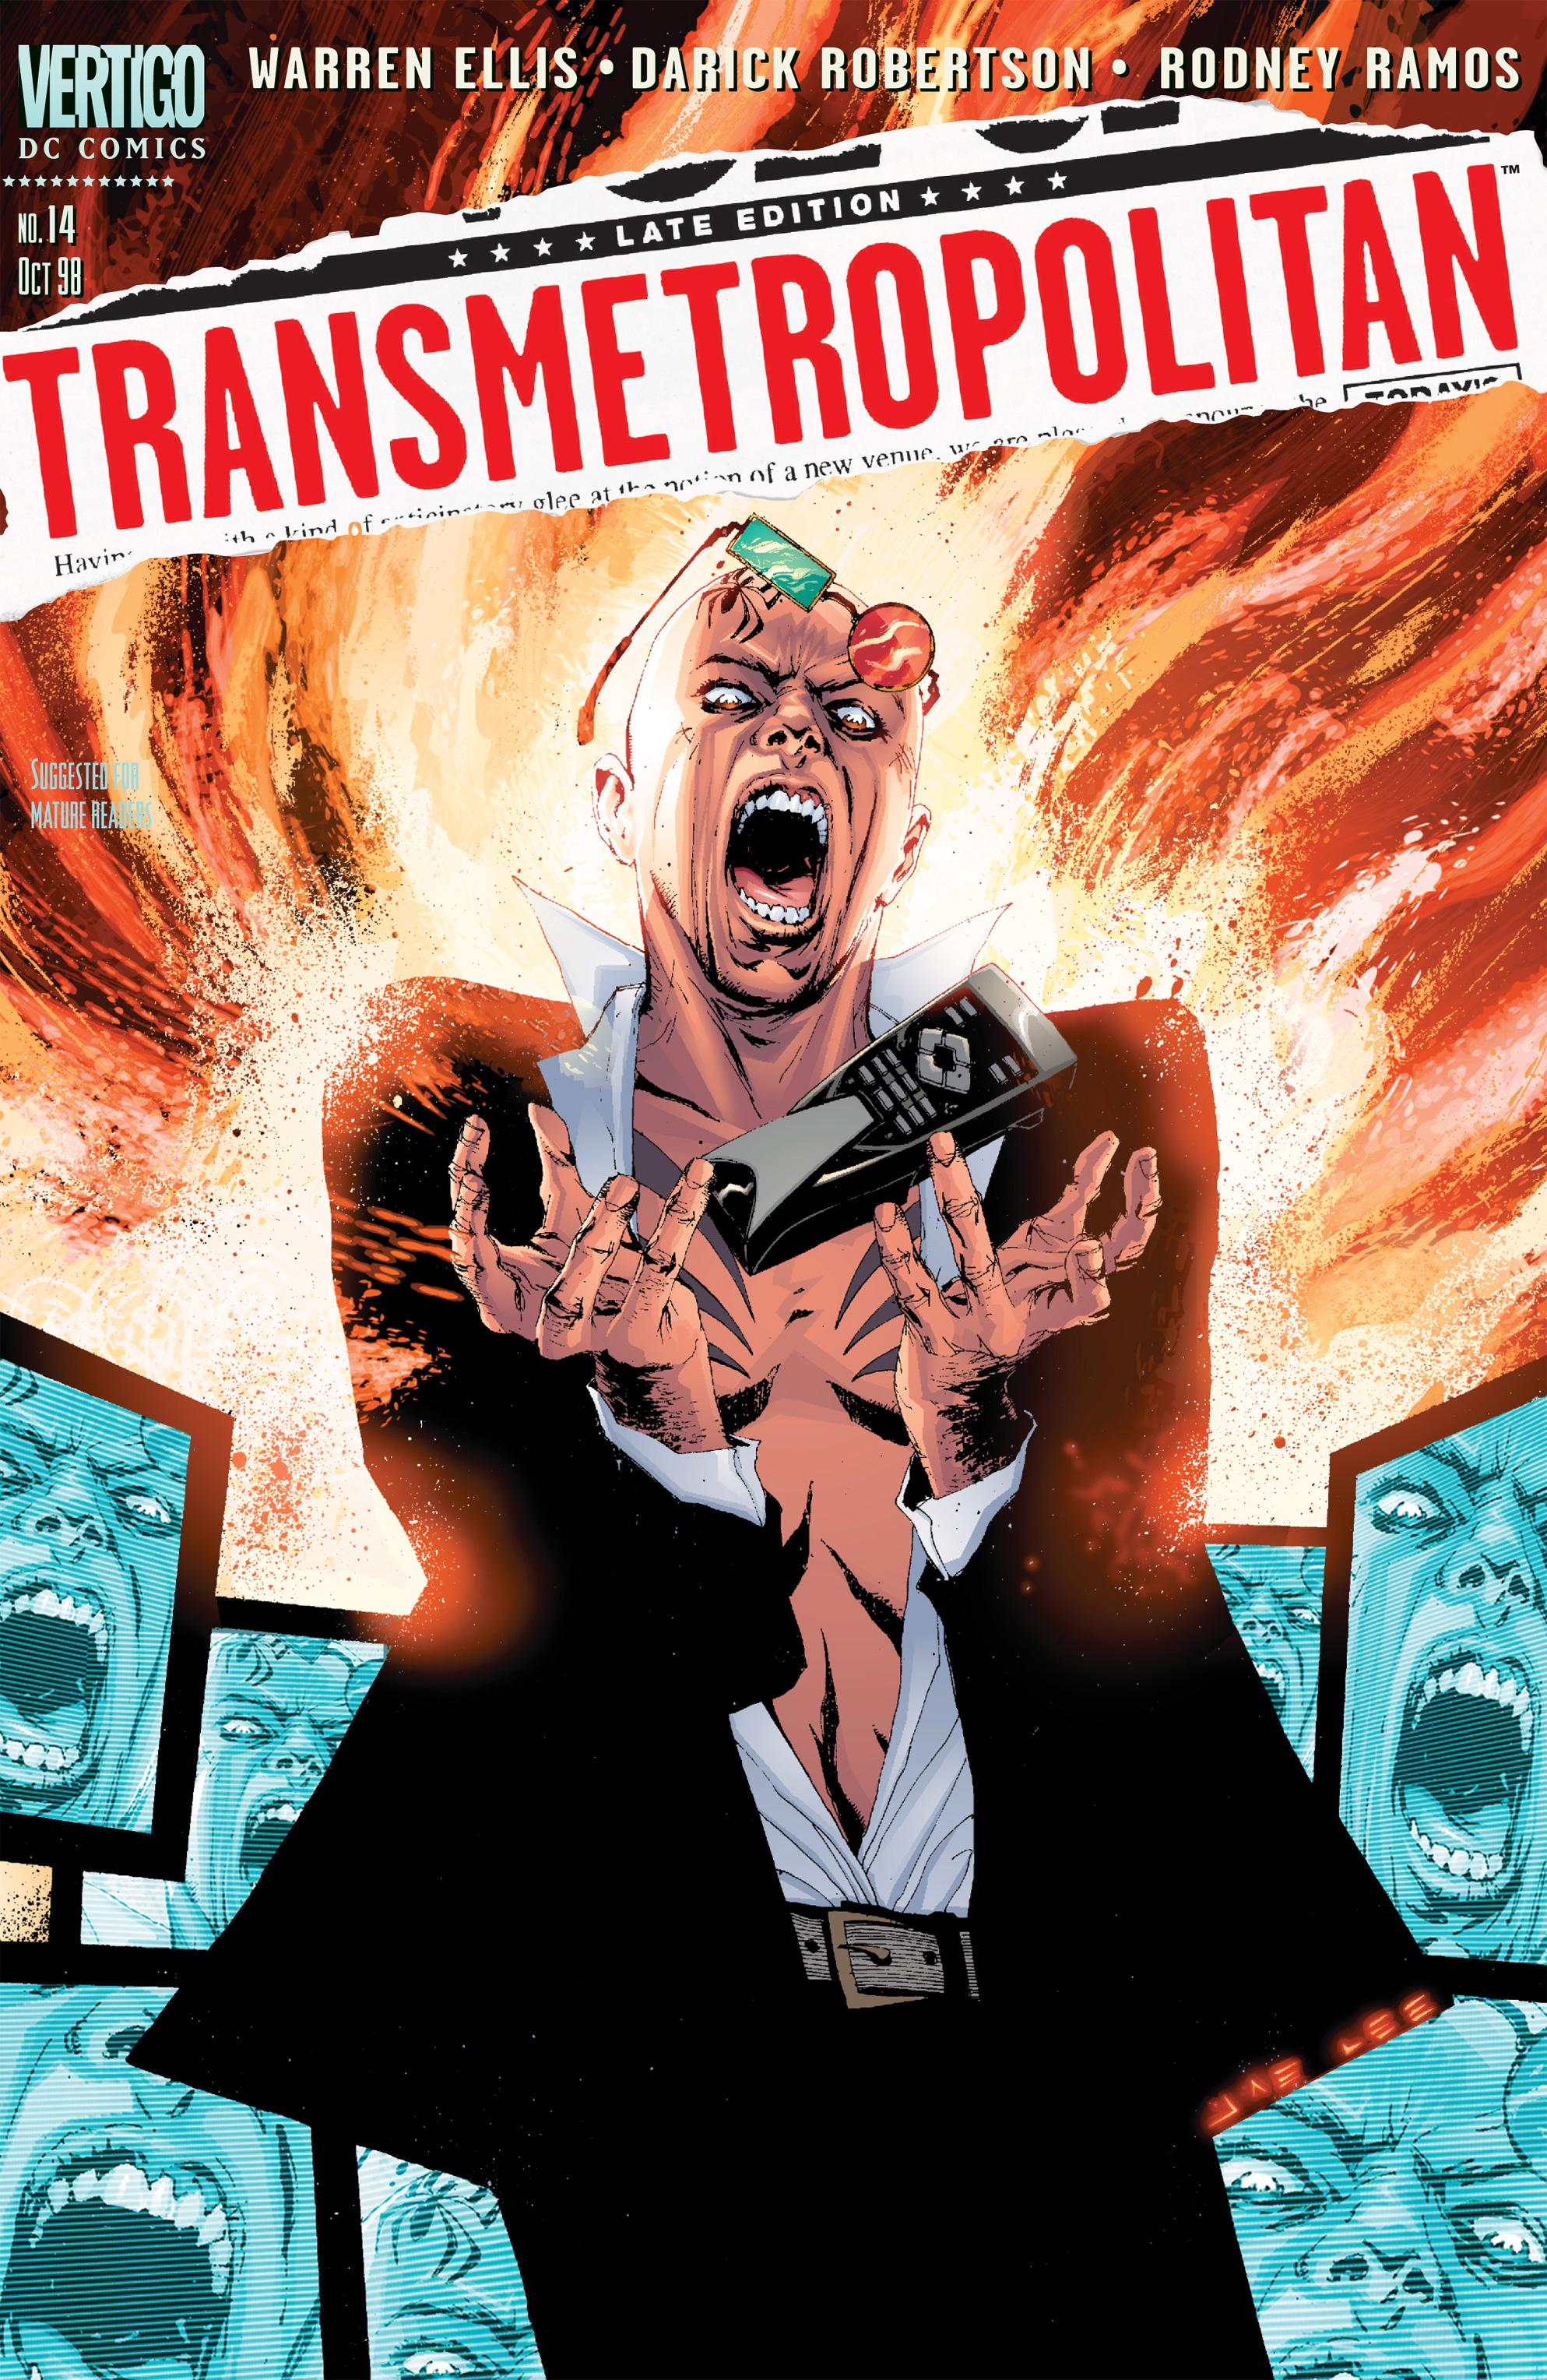 Read online Transmetropolitan comic -  Issue #14 - 1